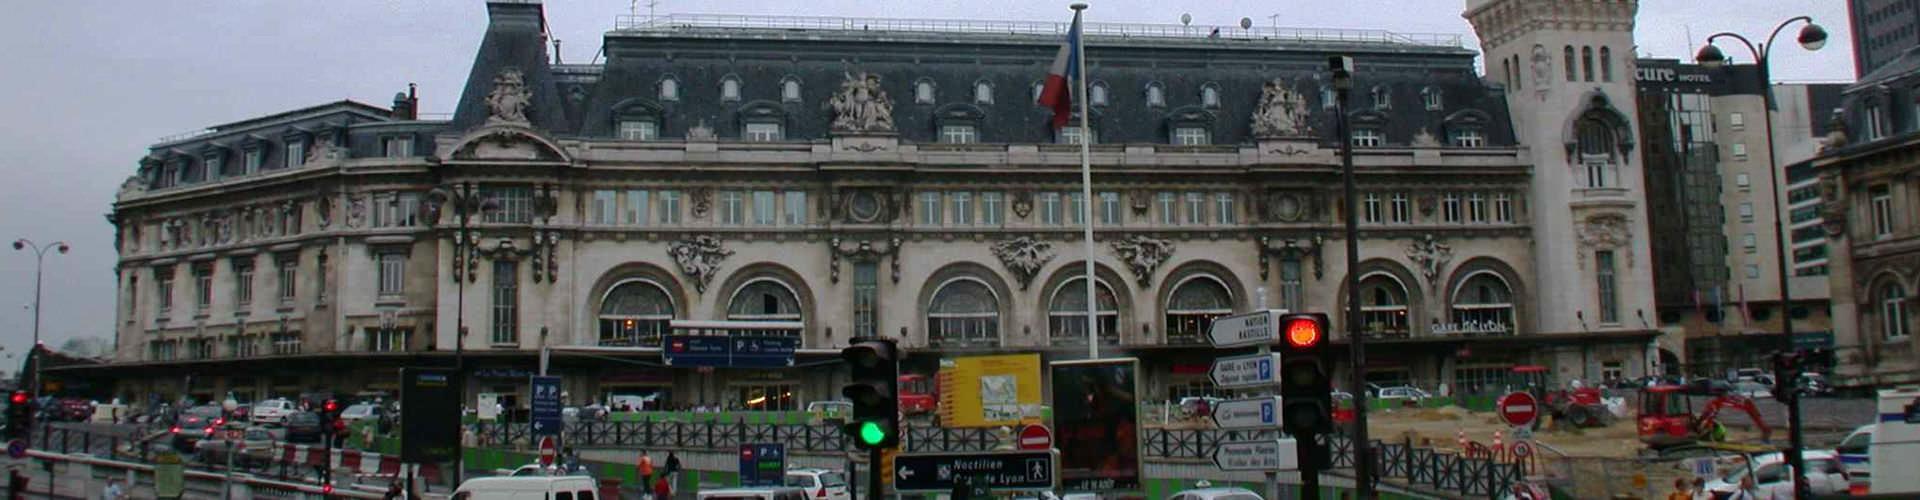 París - Hoteles baratos cerca a Estación de tren de Lyon. Mapas de París, Fotos y comentarios de cada Hotel en París.